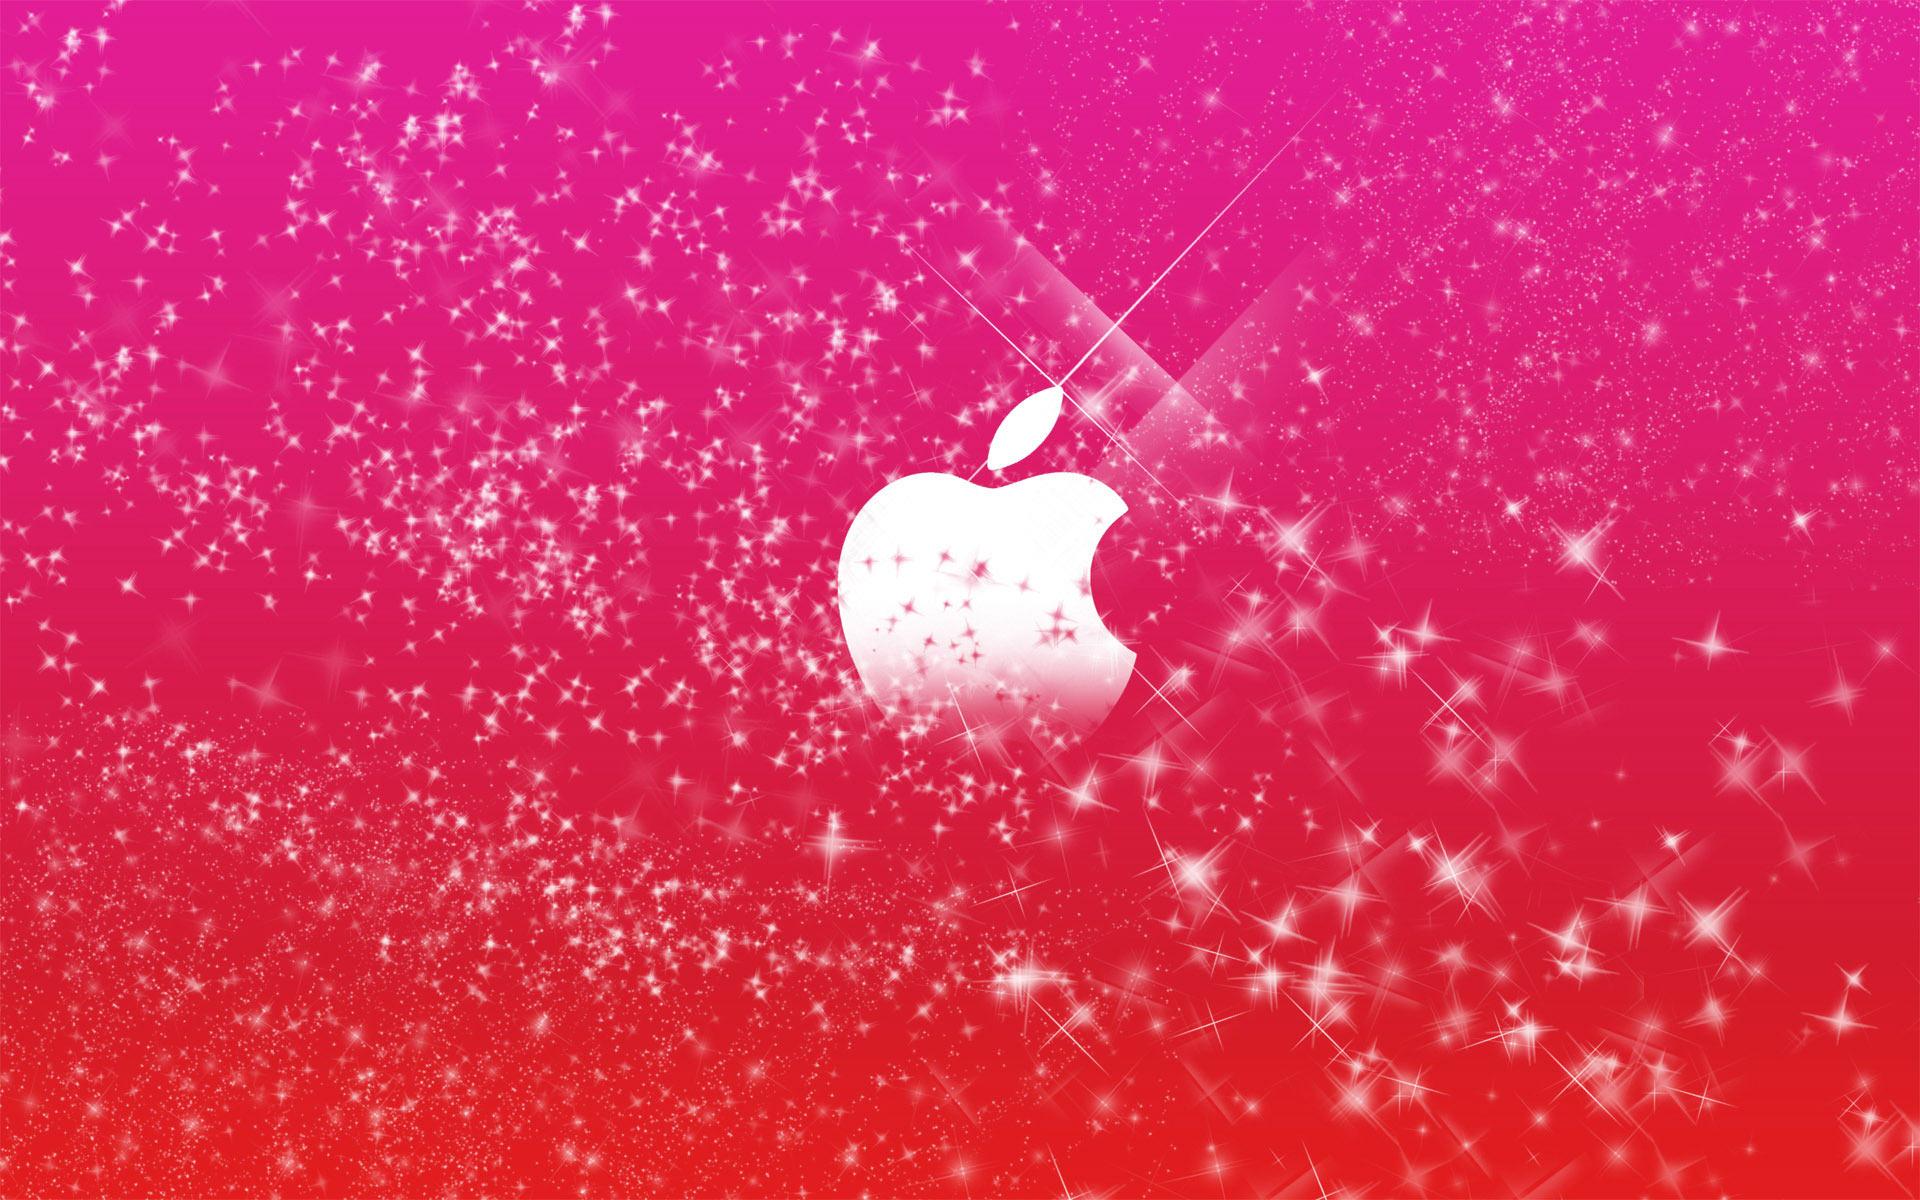 desktop backgrounds for mac cool desktop backgrounds for mac 1920x1200